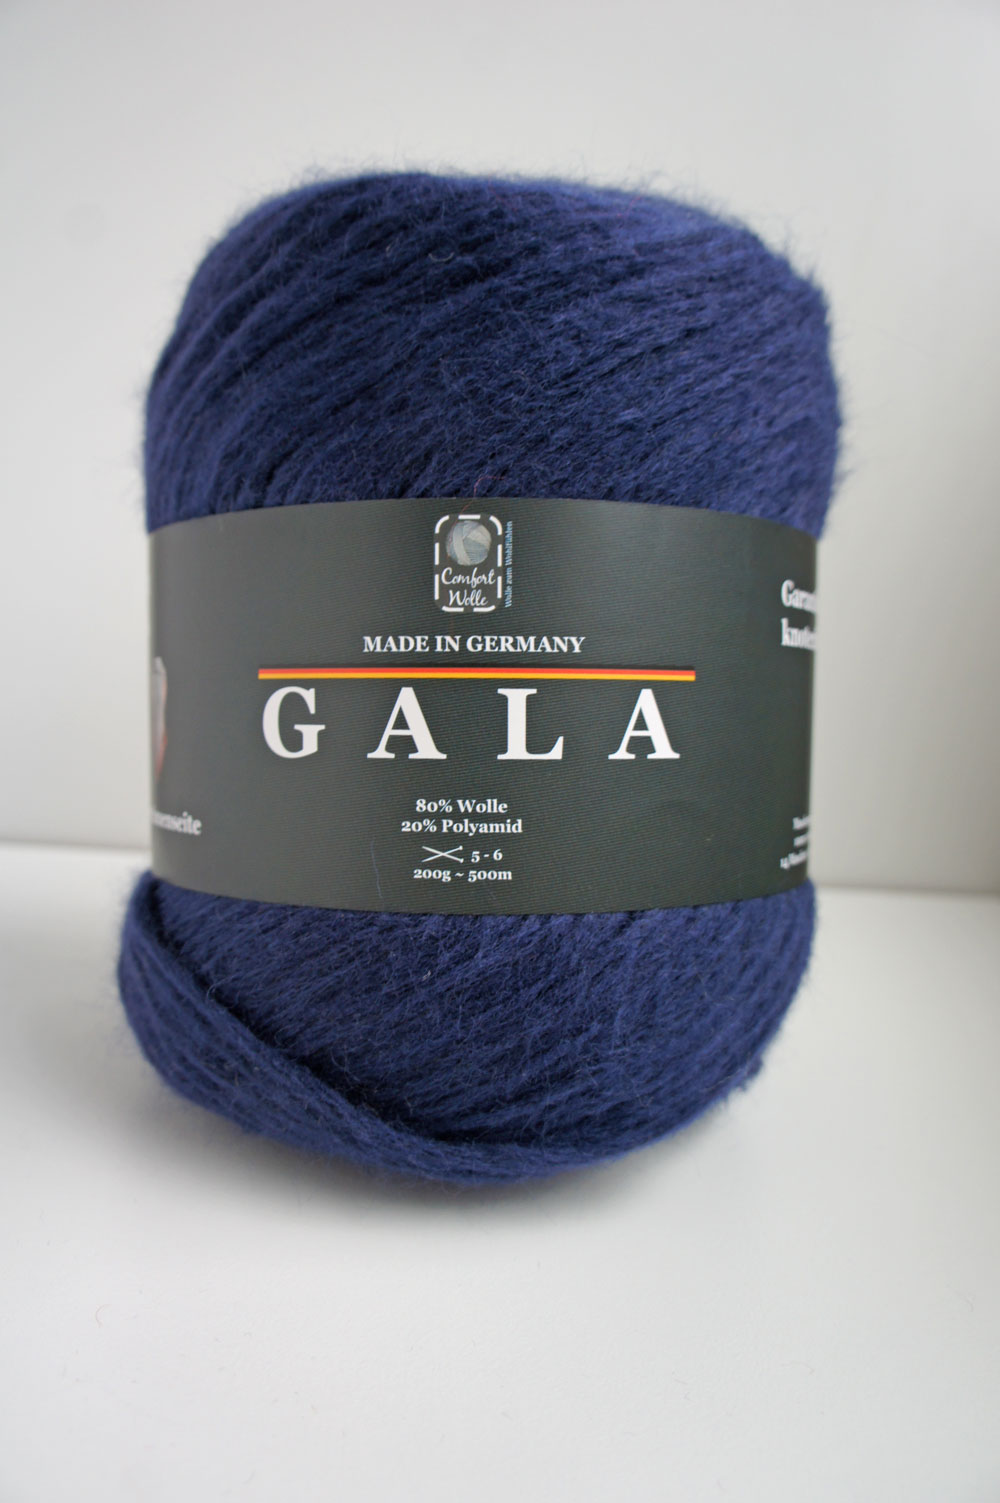 Poncho stricken - Studio Yarn - Gala Wollknäuel